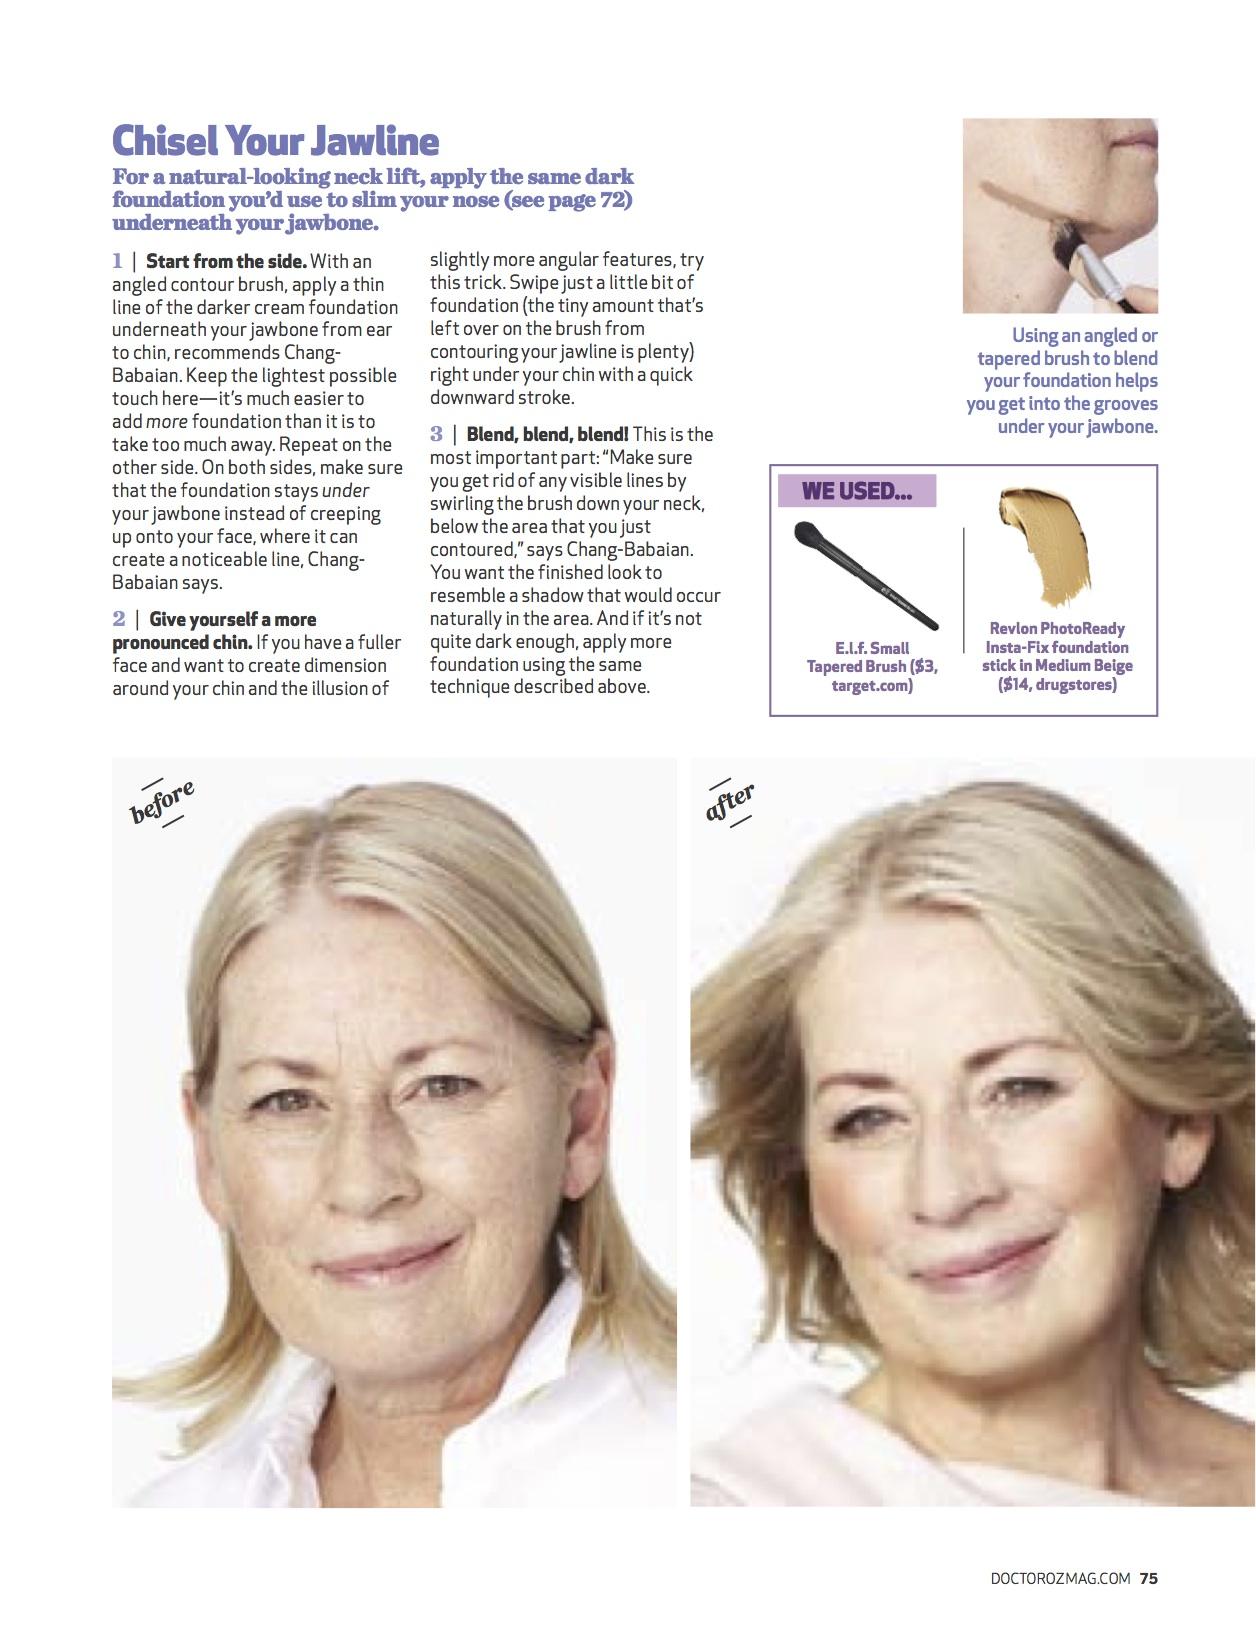 Dr Oz Makeup[1] copy 6.jpg